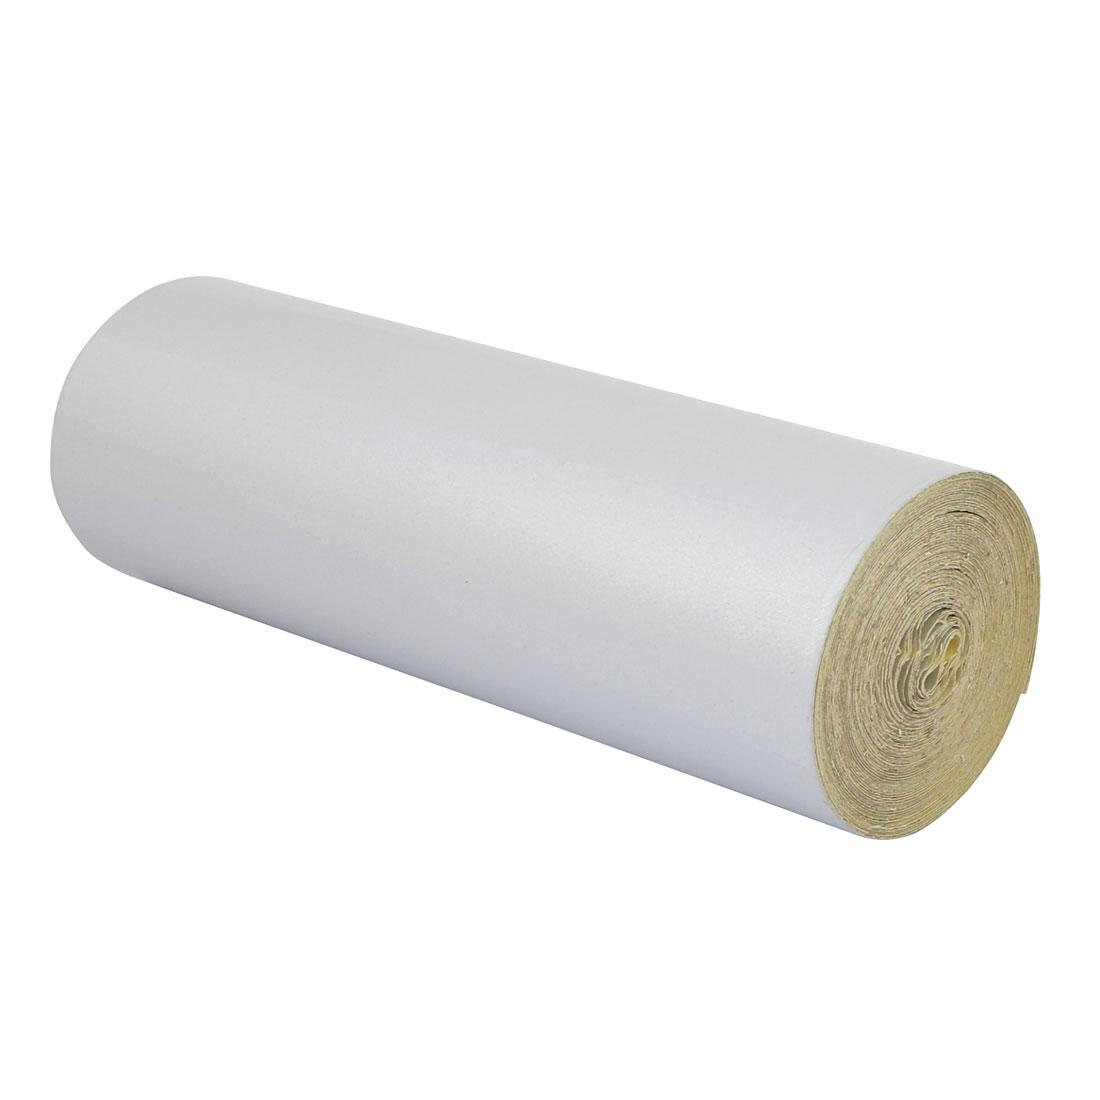 Single Sided Adhesive Reflective Warning Tape White 15M Length 20cm Width